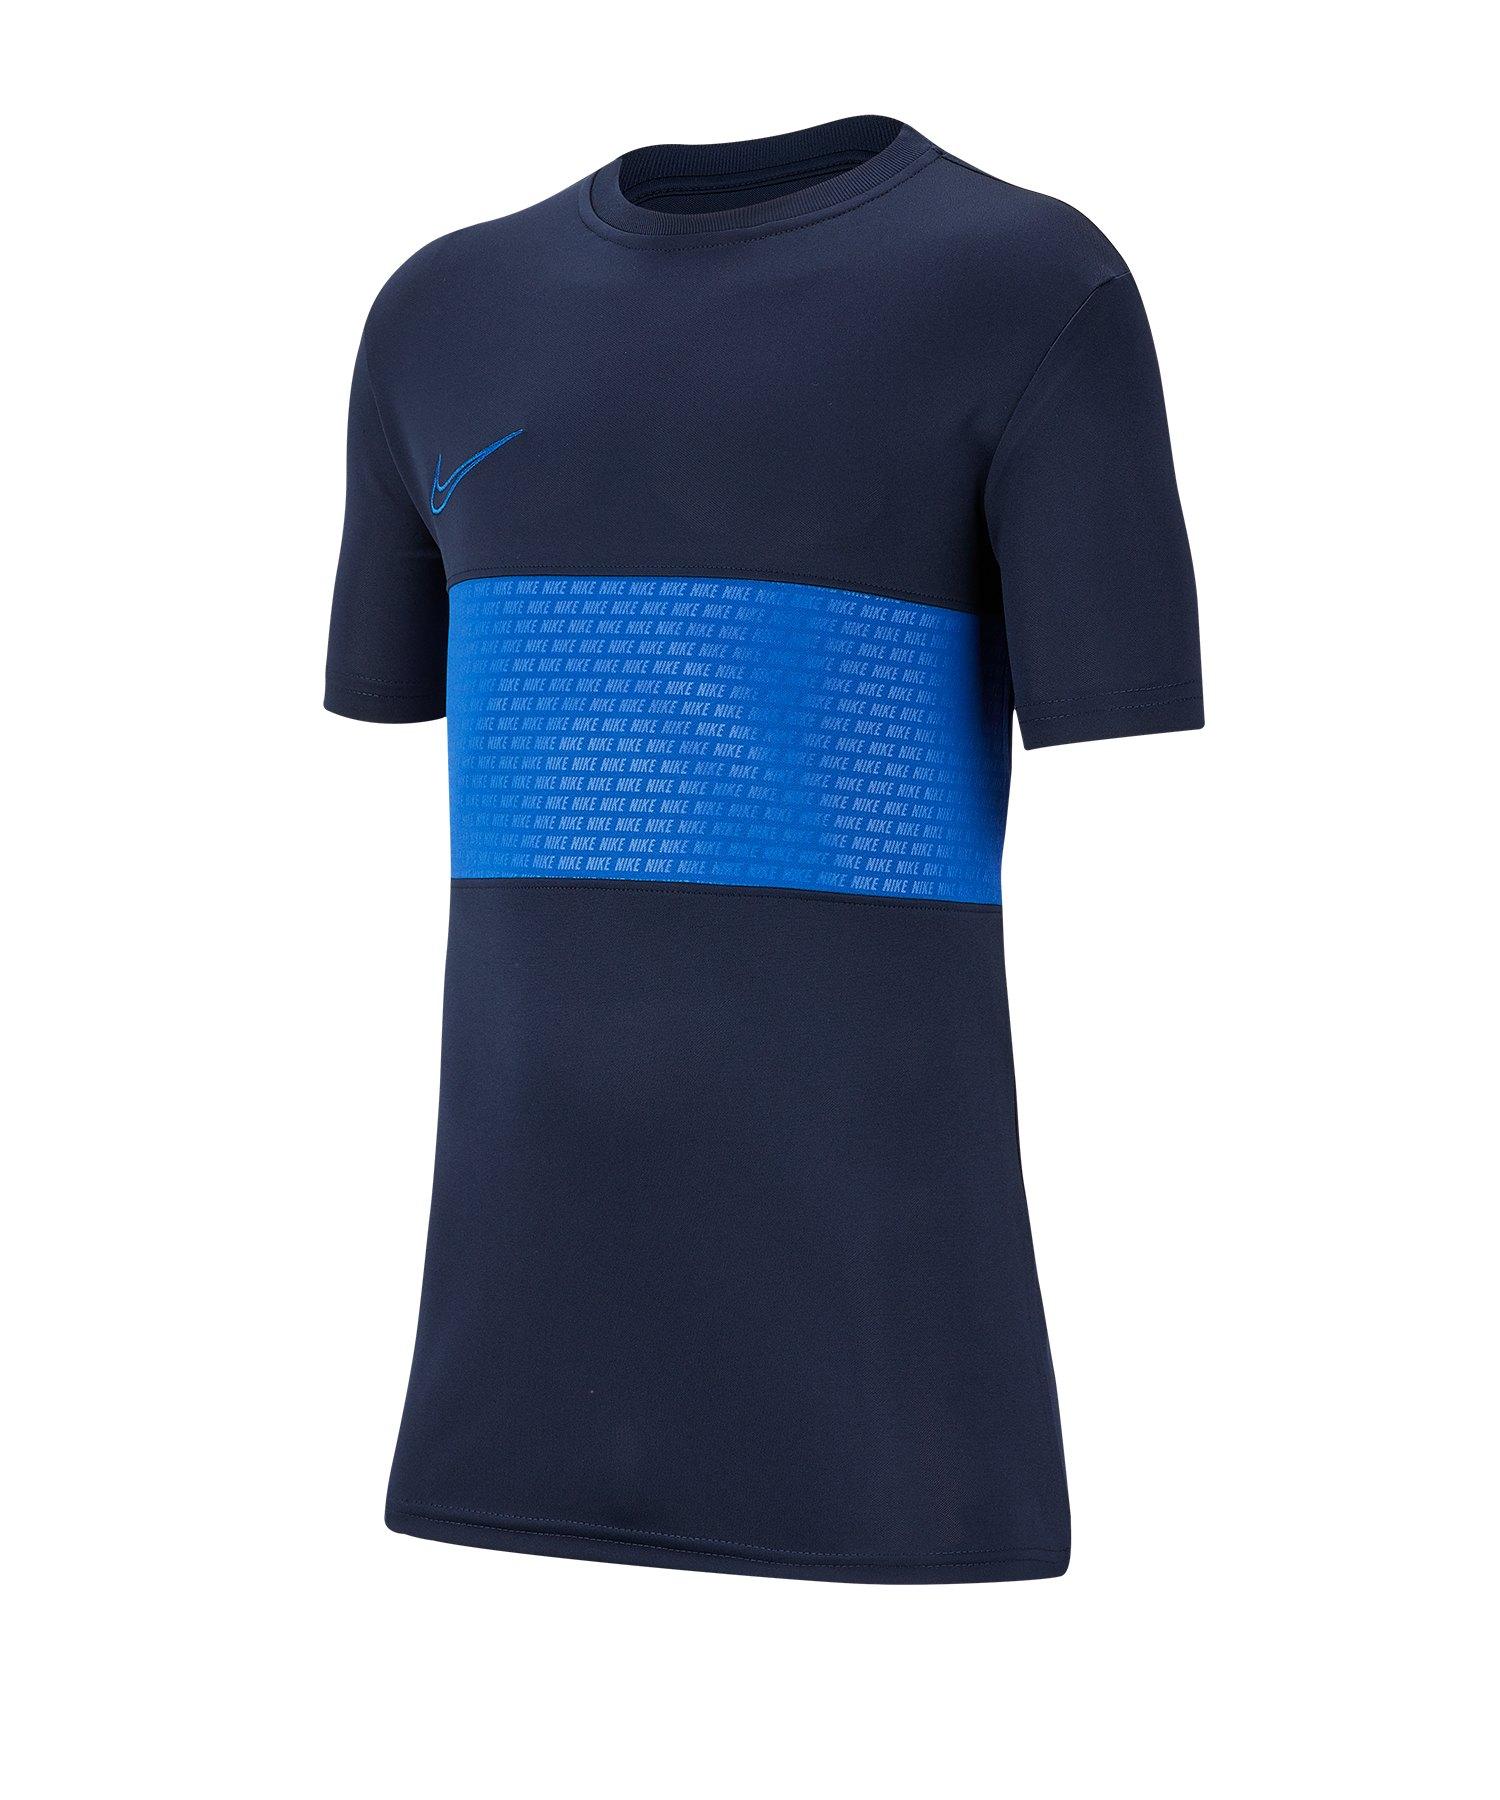 Nike Dri-FIT Academy Tee T-Shirt Kids Blau F452 - Blau